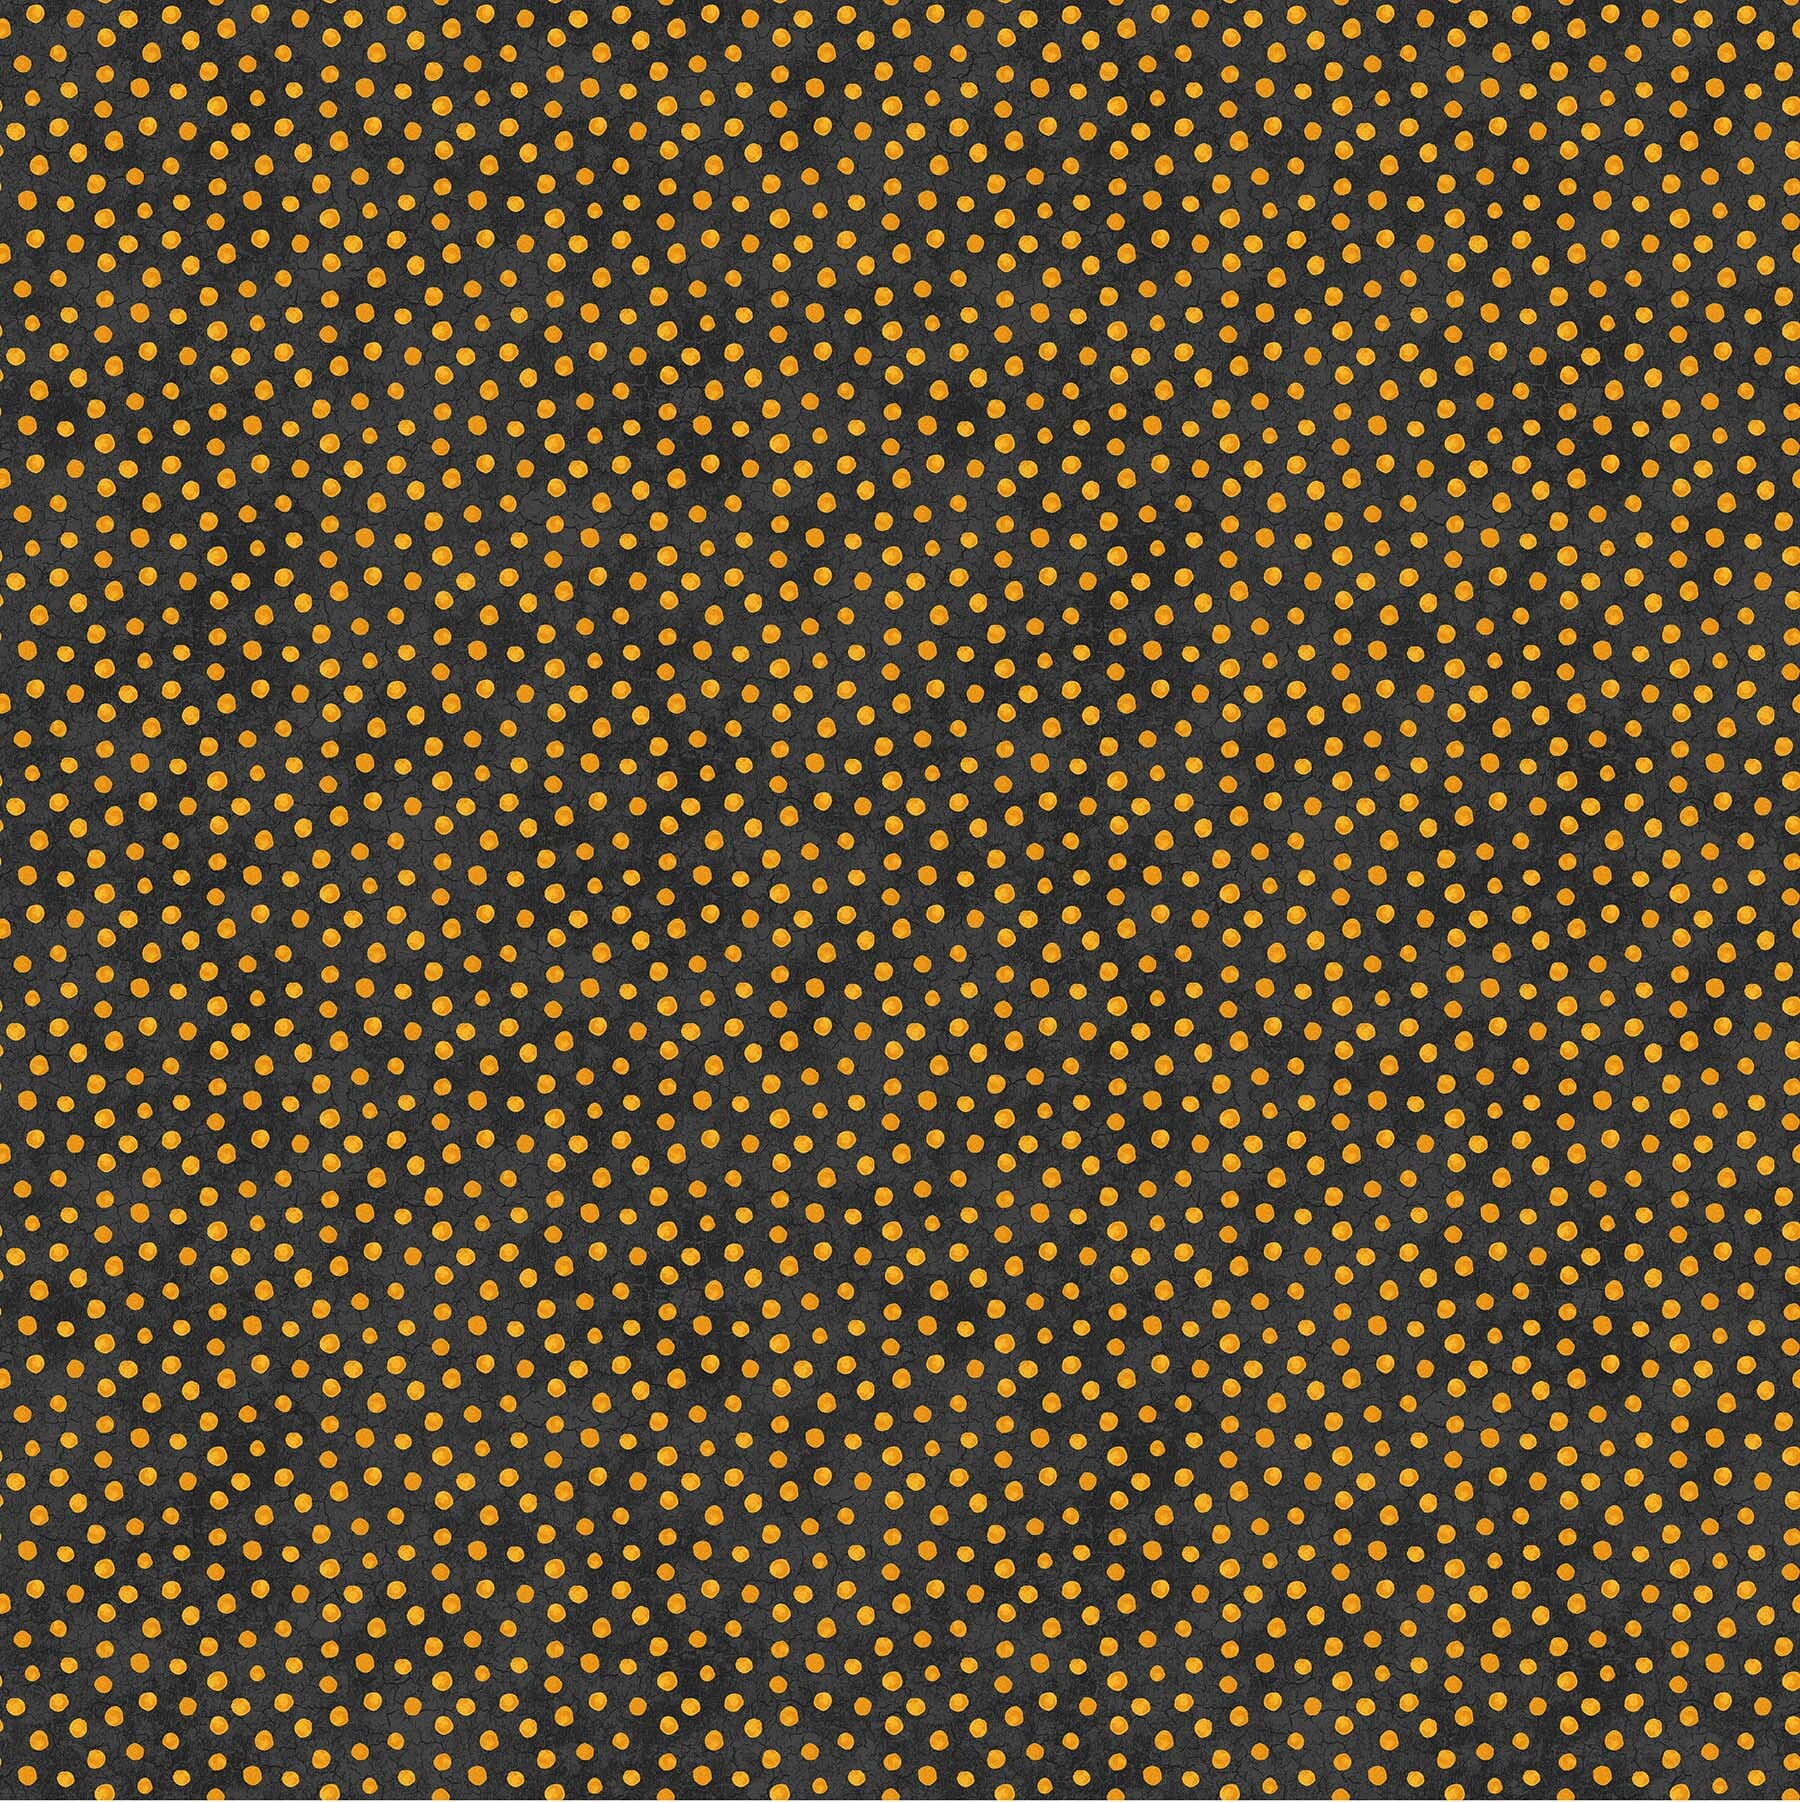 Black Cat Capers - Orange Dots on Black - 1/2m cut 57894